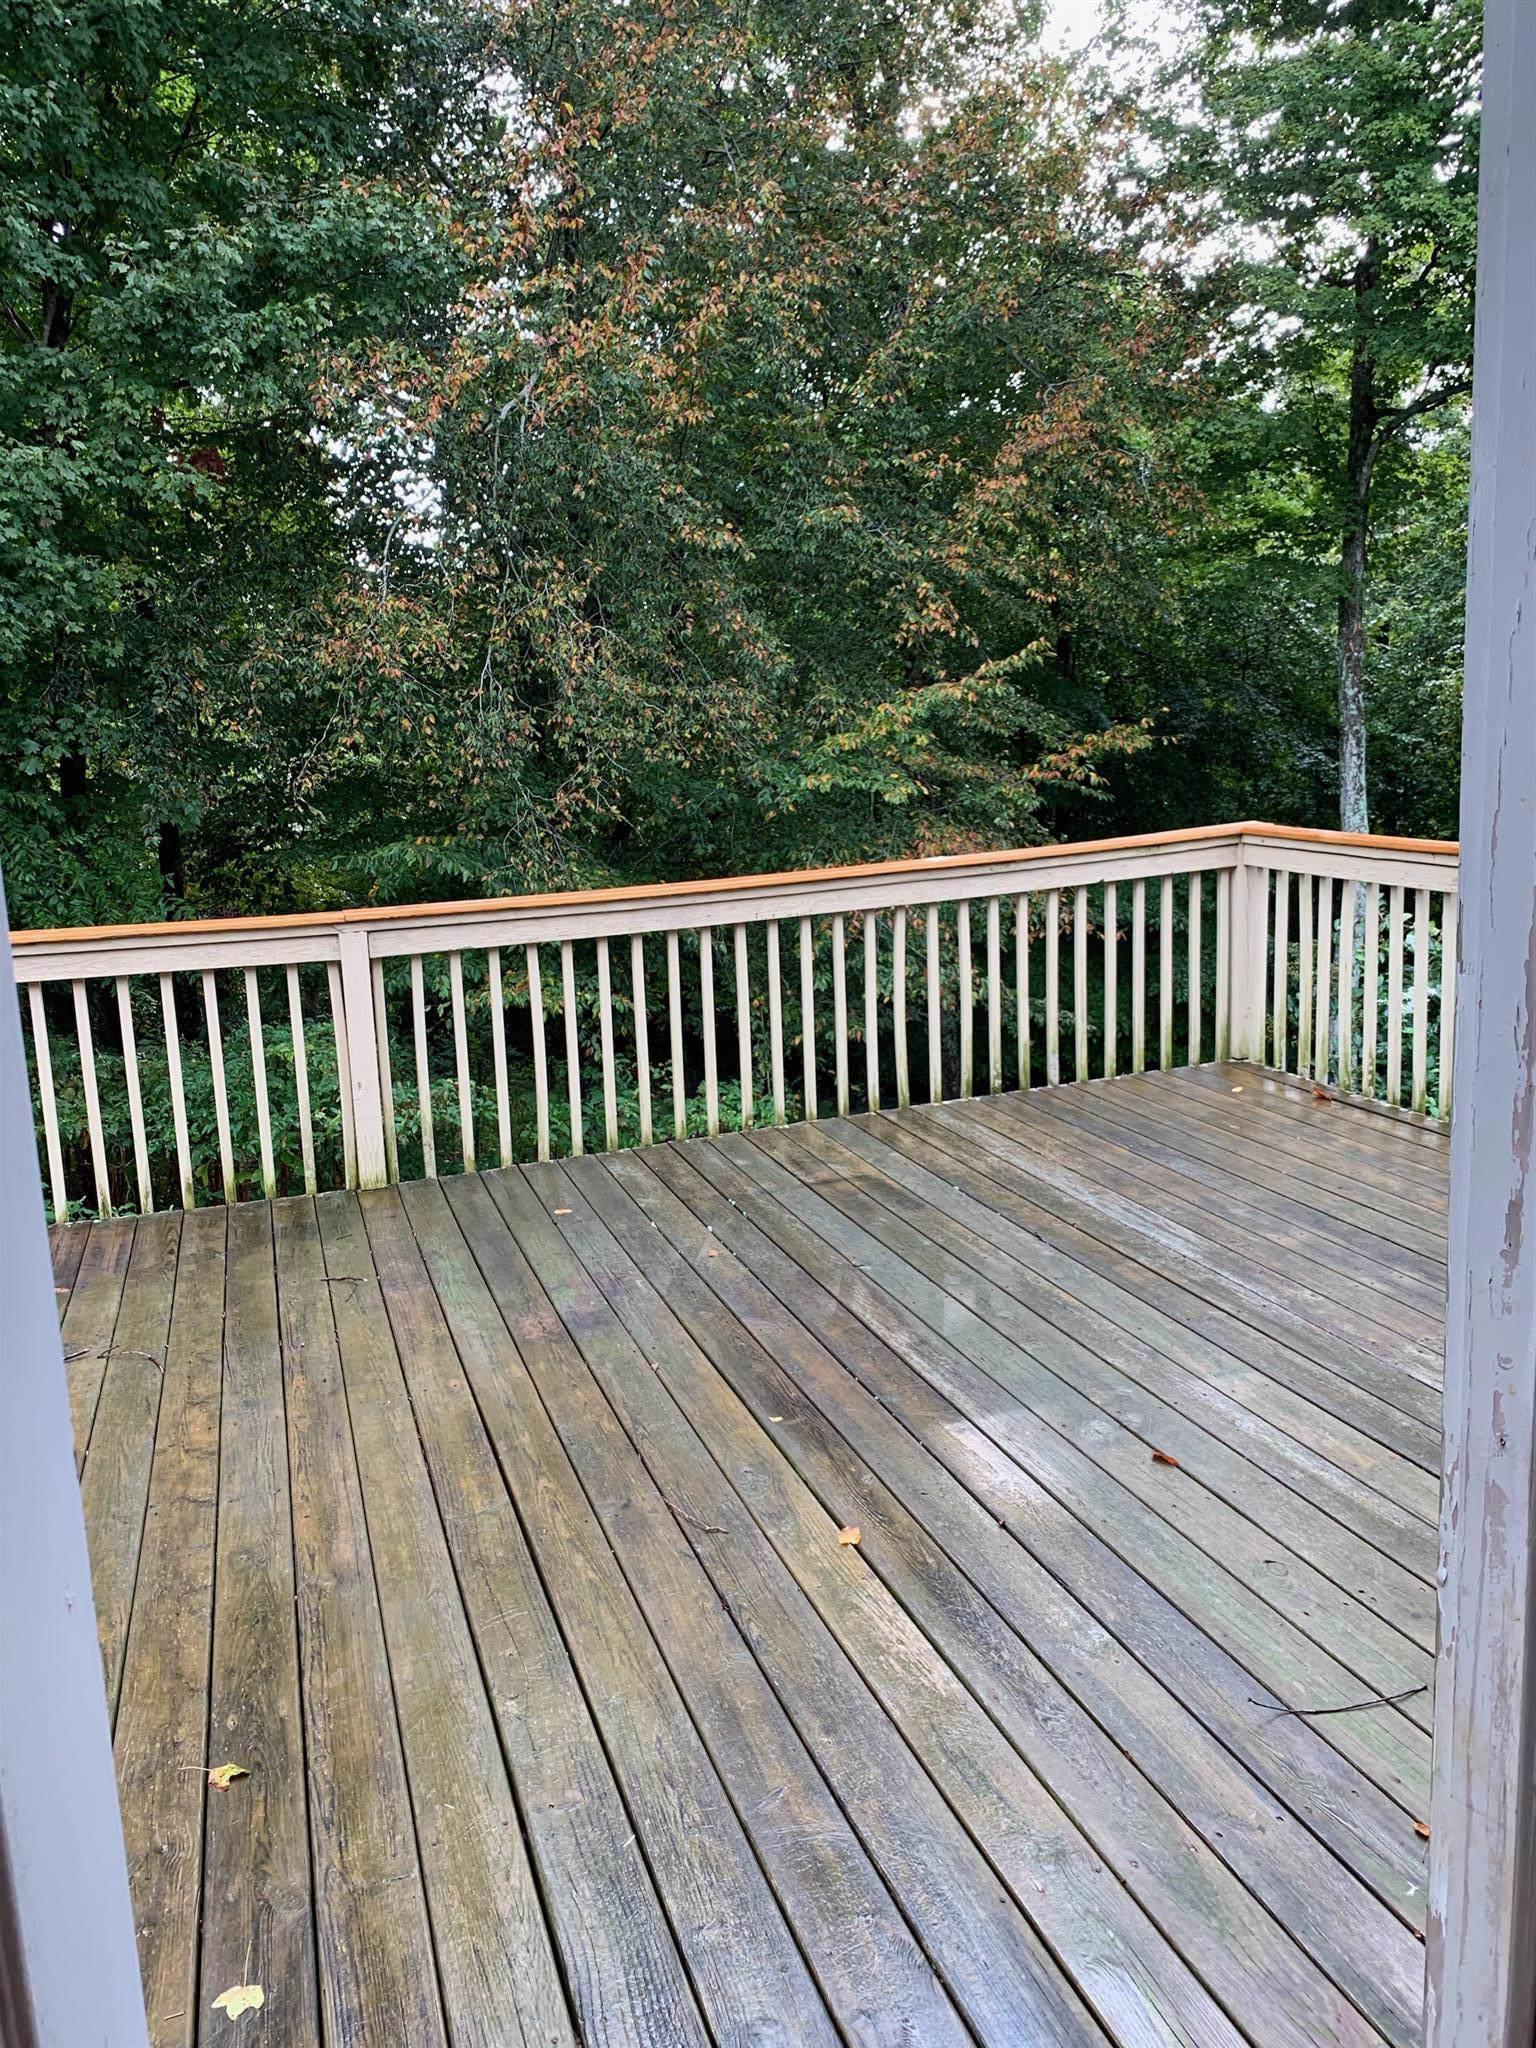 3049 Bowker Road, Charlotte, TN 37036 (MLS #RTC2032889) :: Village Real Estate